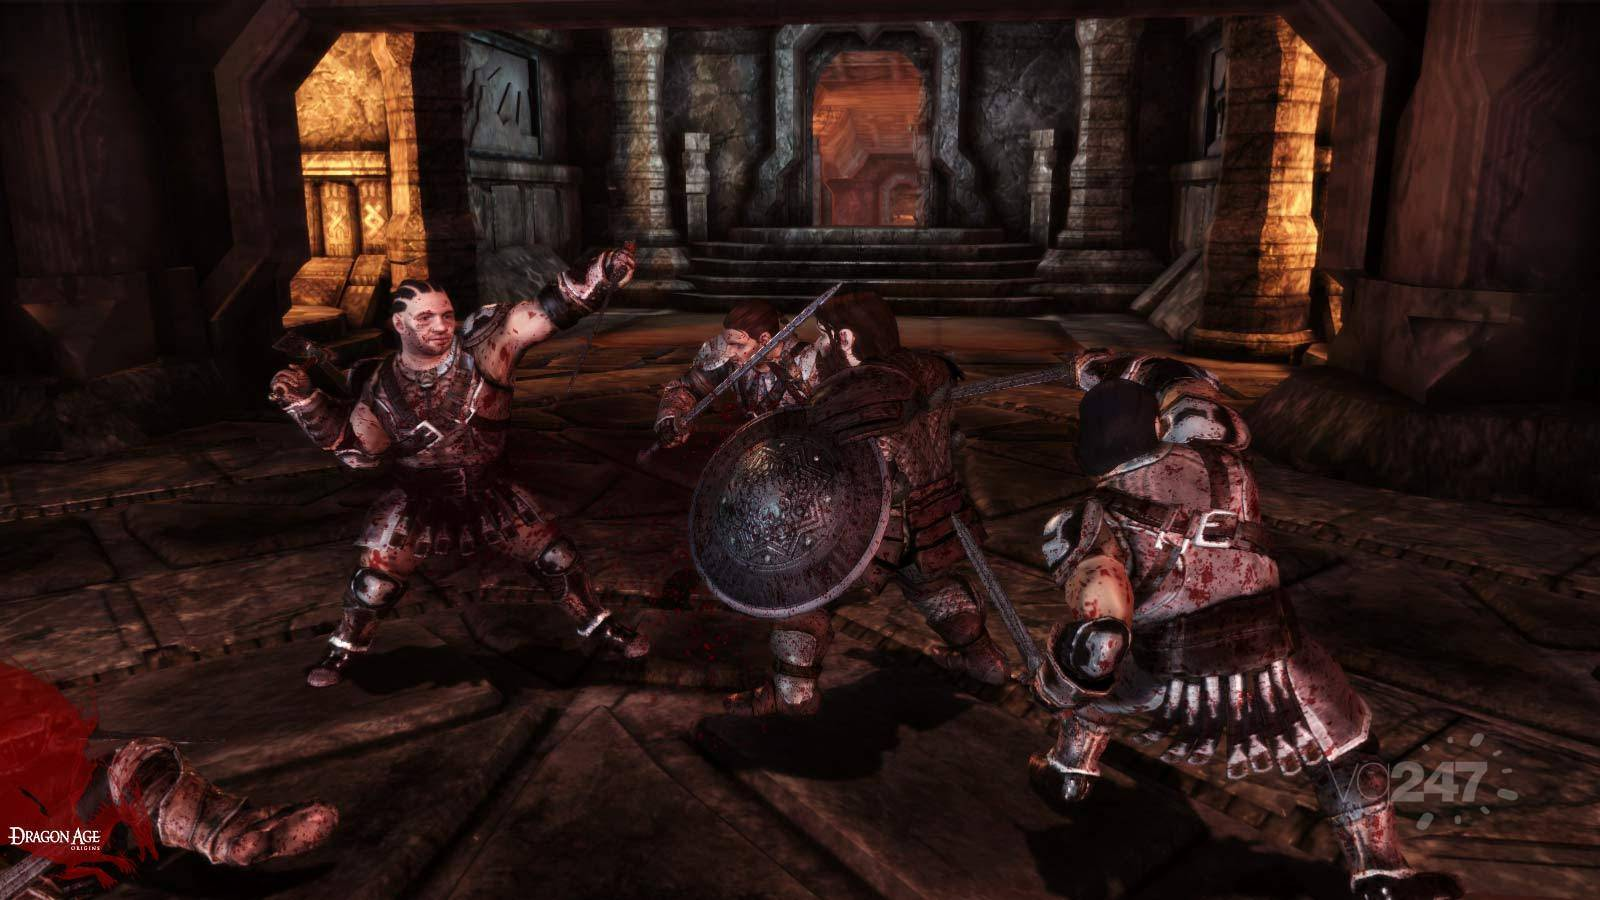 dragon age origins dwarf4_jpg_jpgcopy